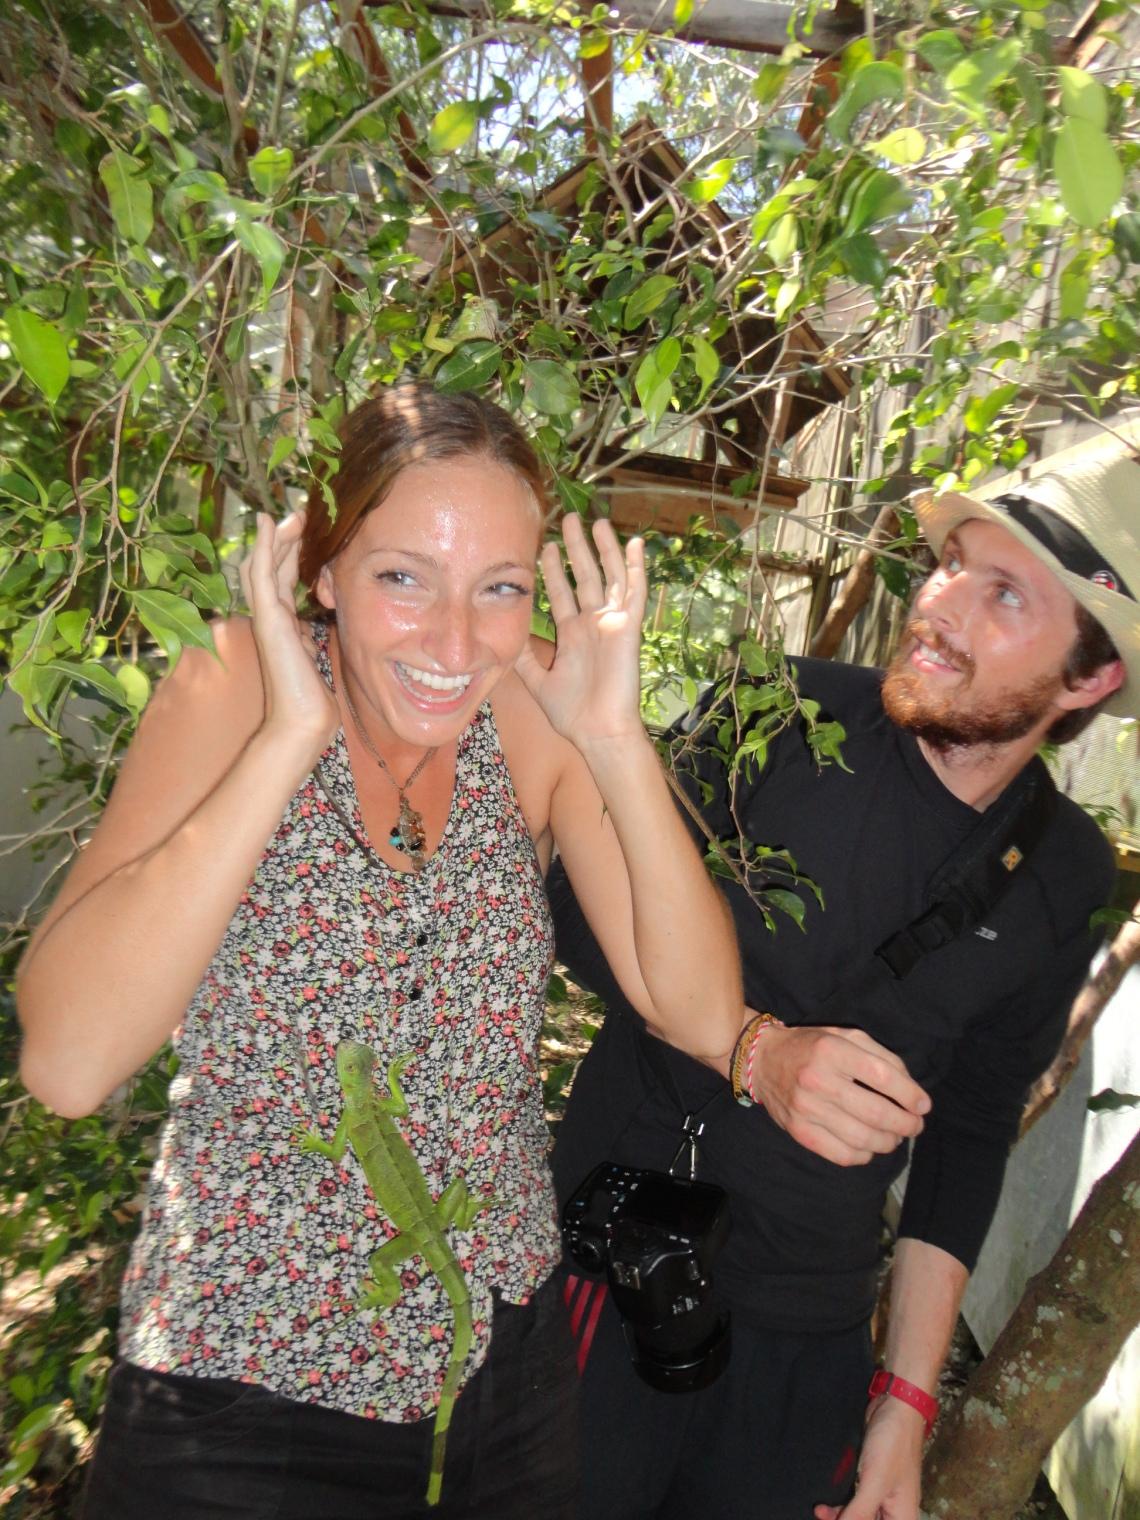 Getting attacked by baby iguanas in San Ignacio